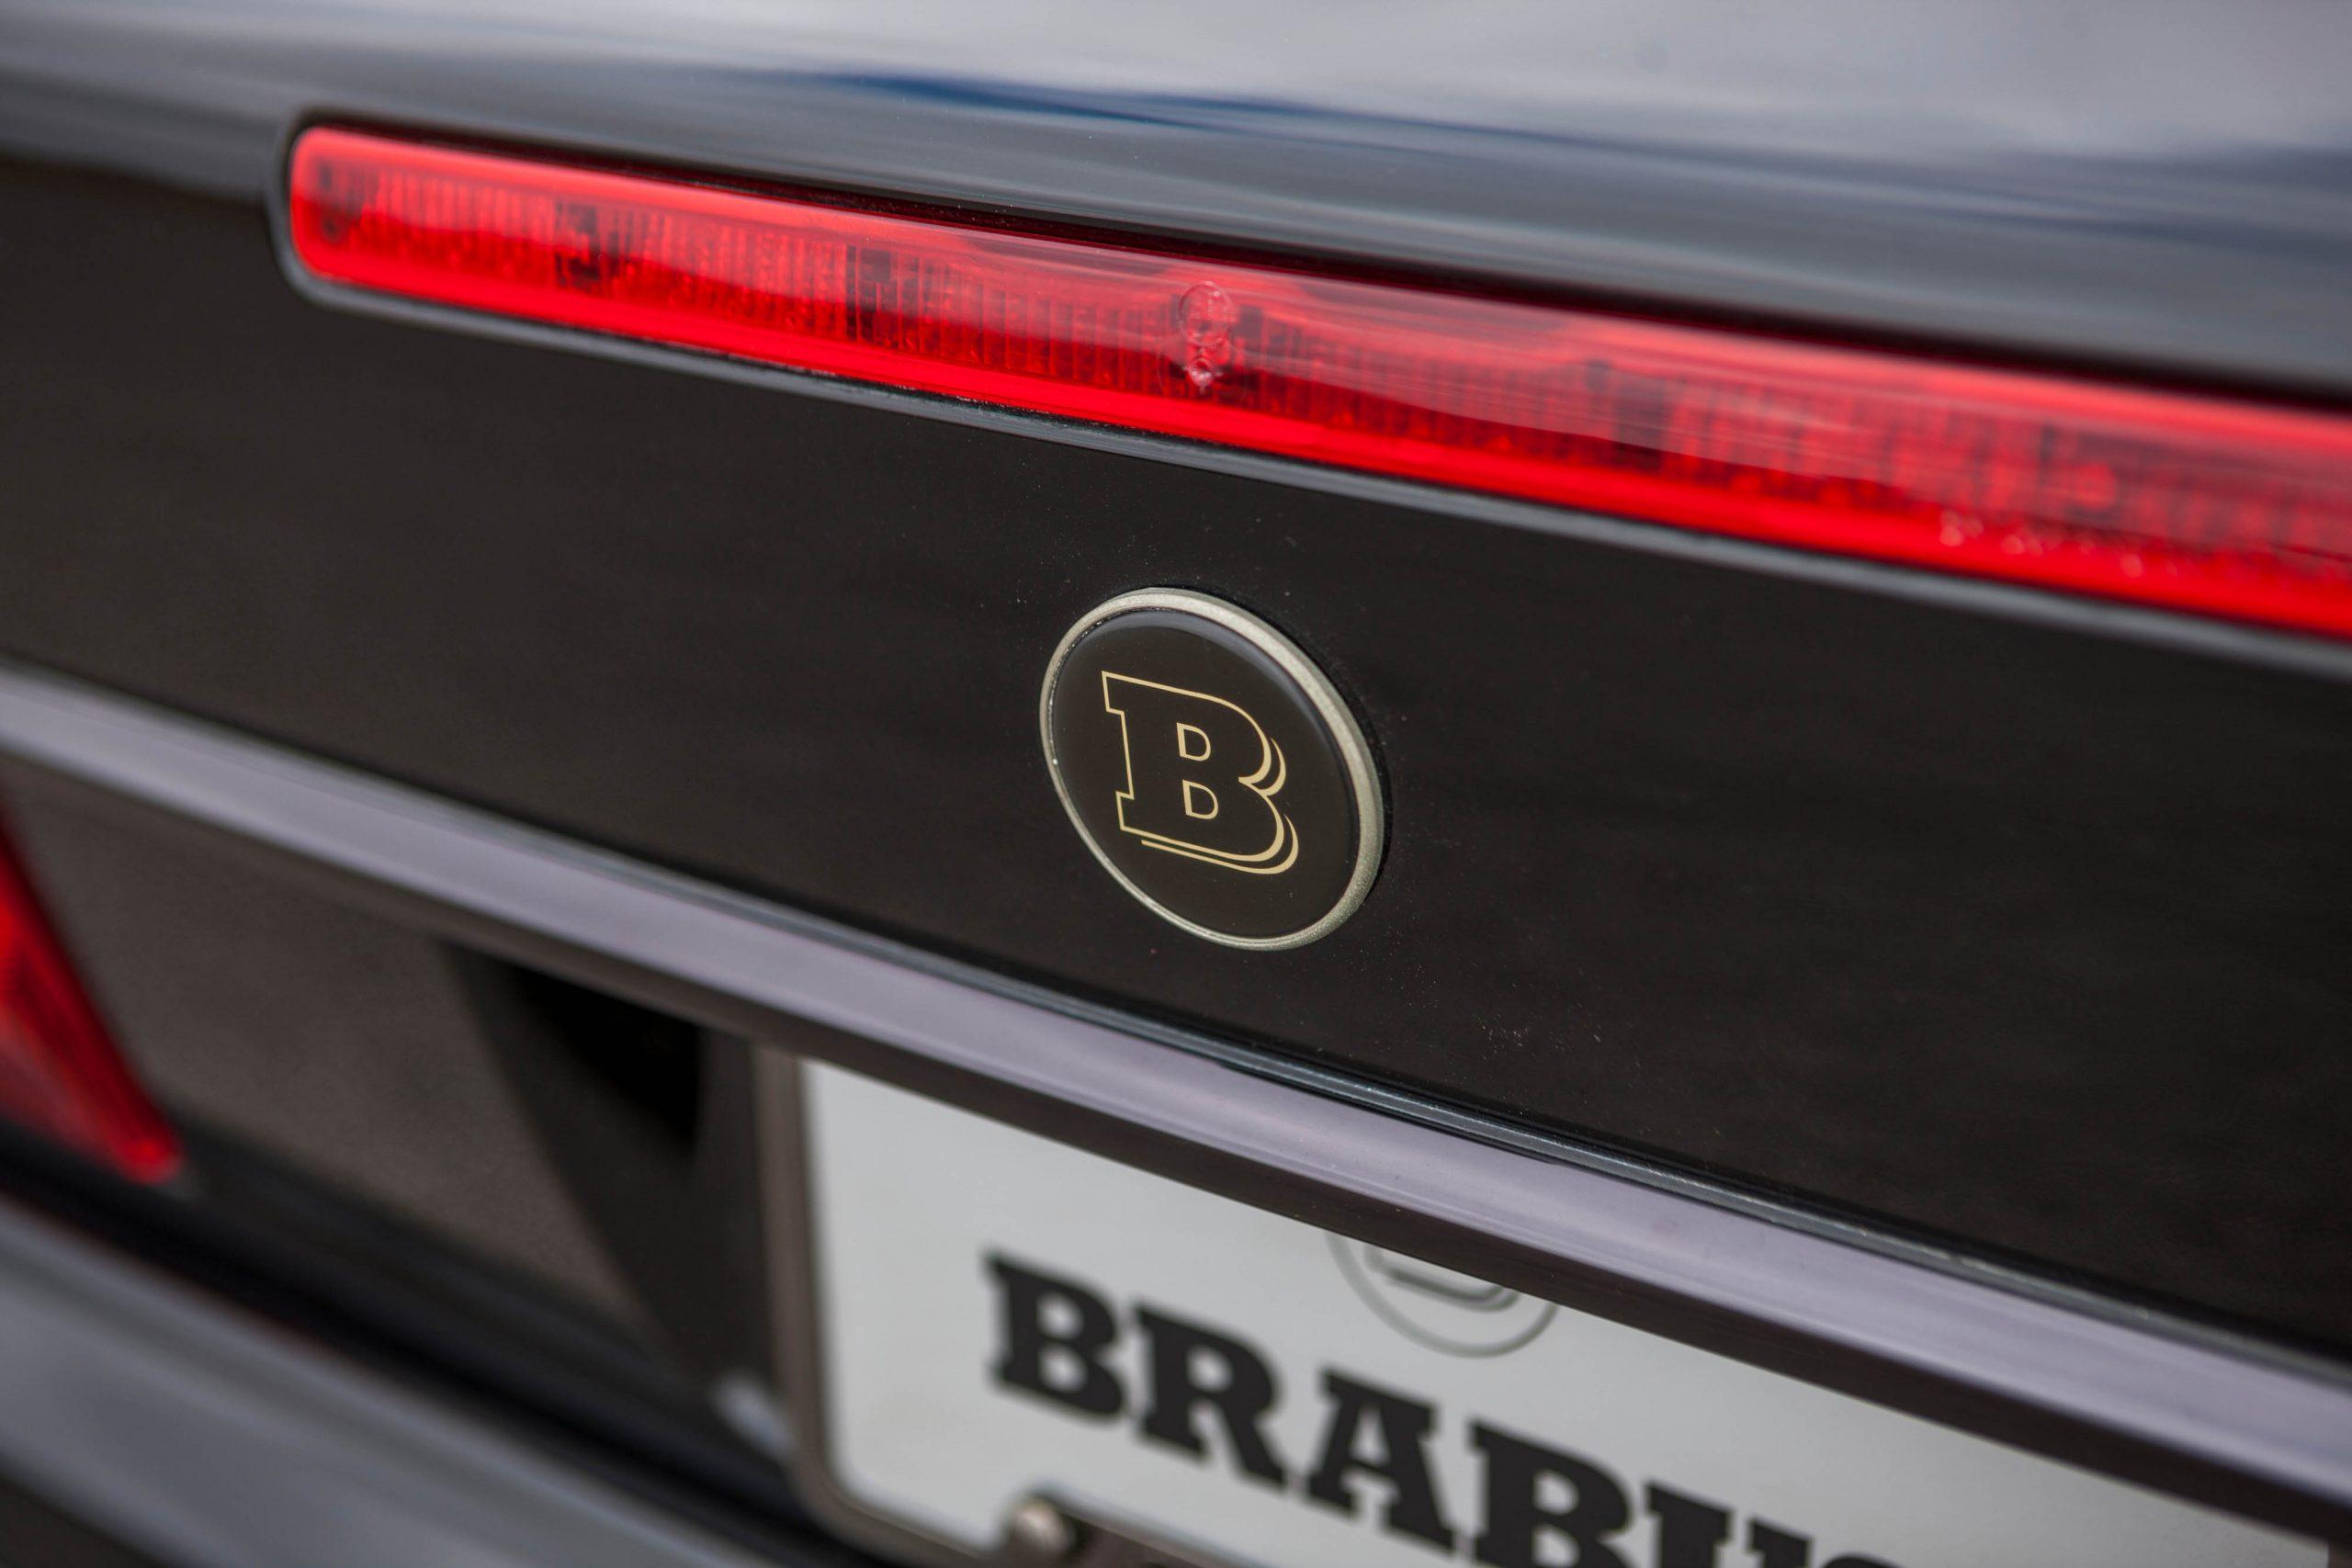 1999 Mercedes-Benz Brabus 7.3 S rear badge